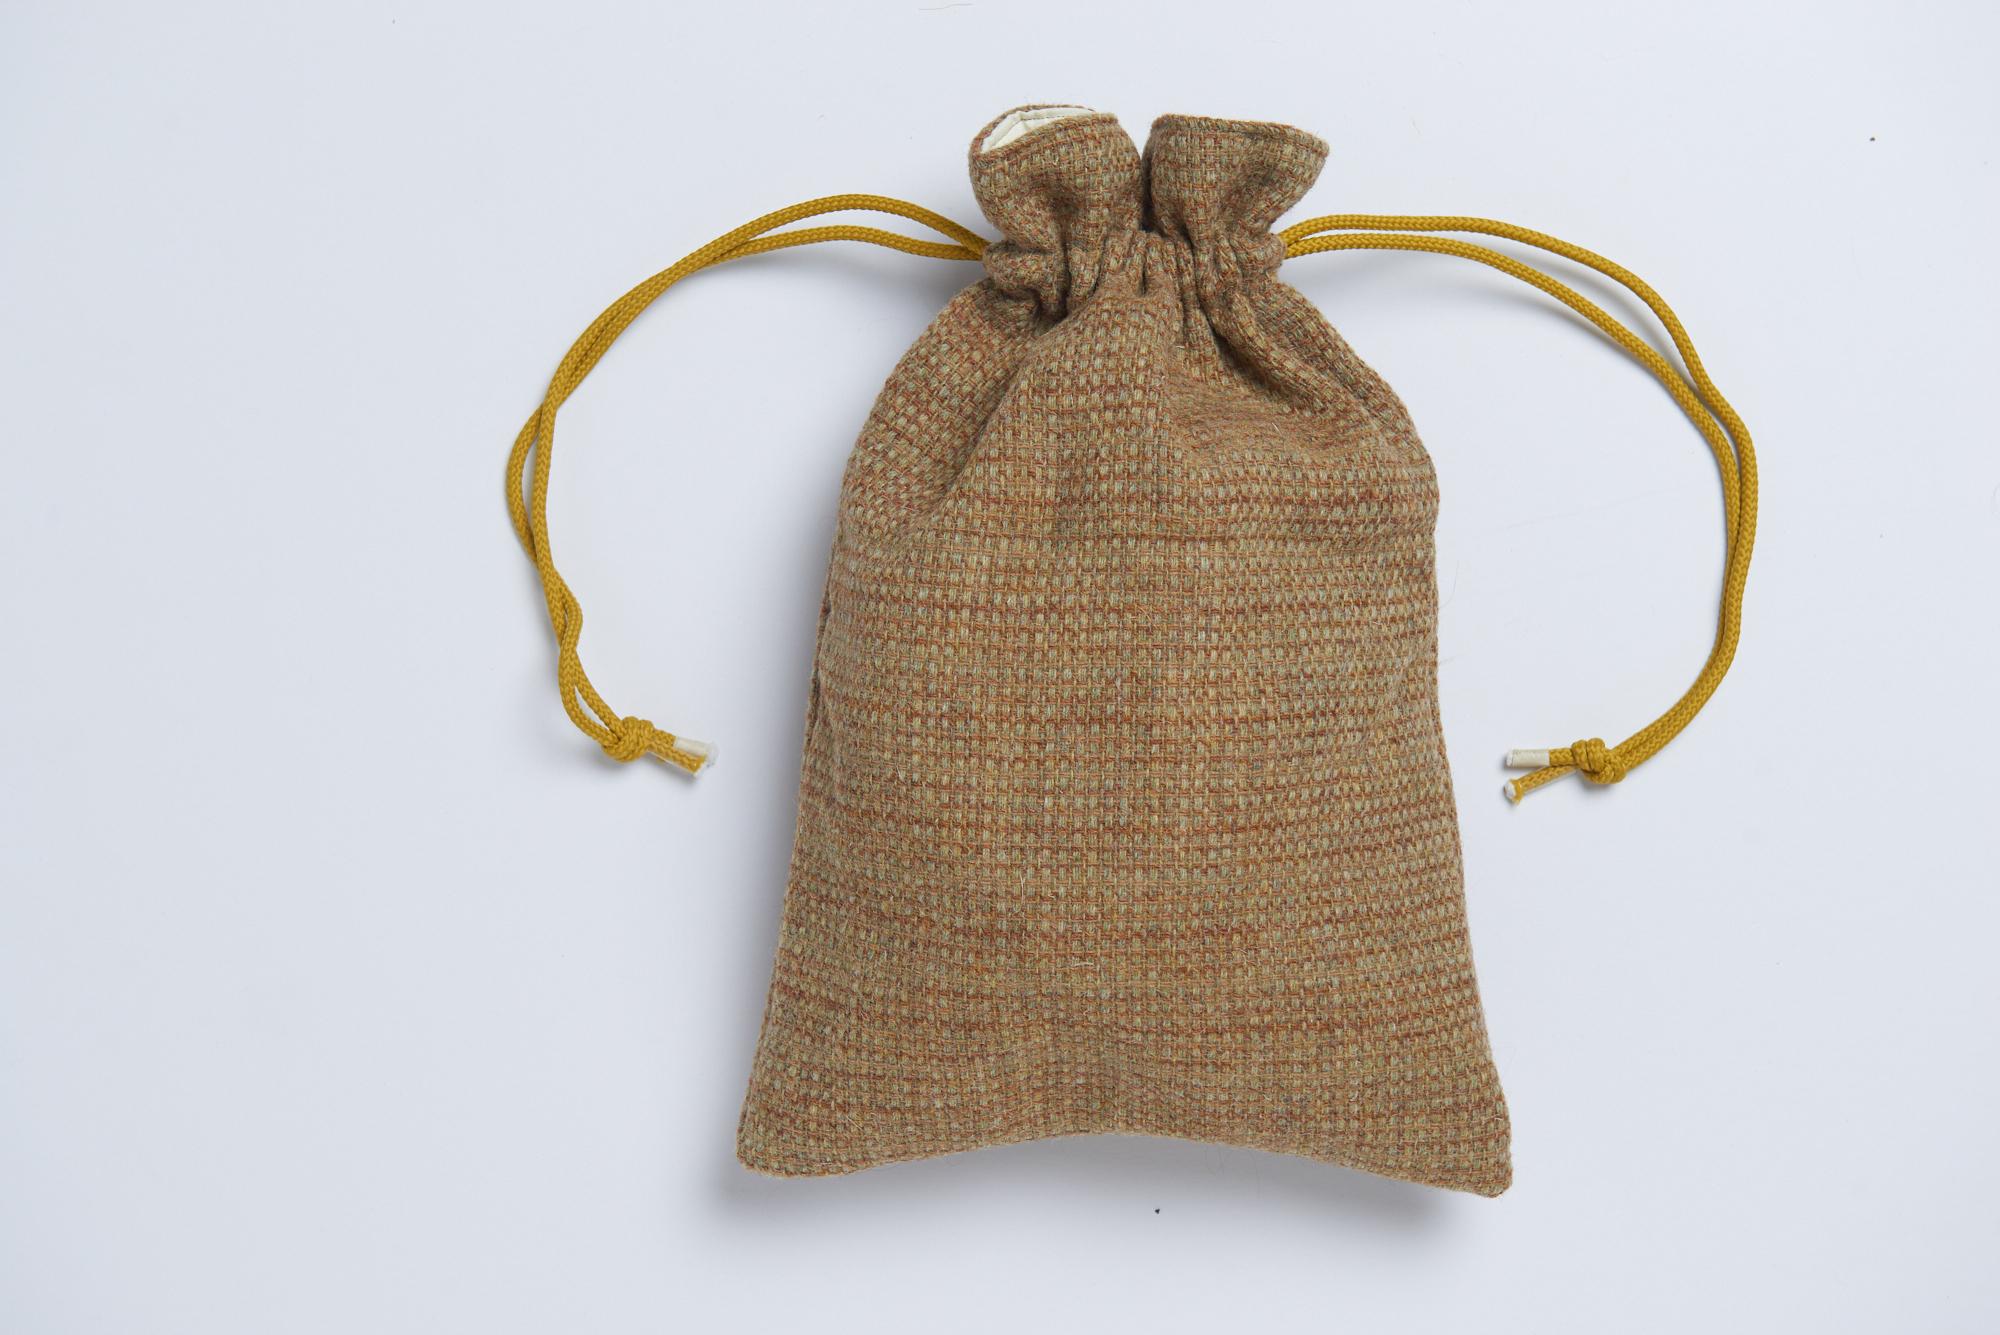 Snug0128Harris Tweed drawstring bag